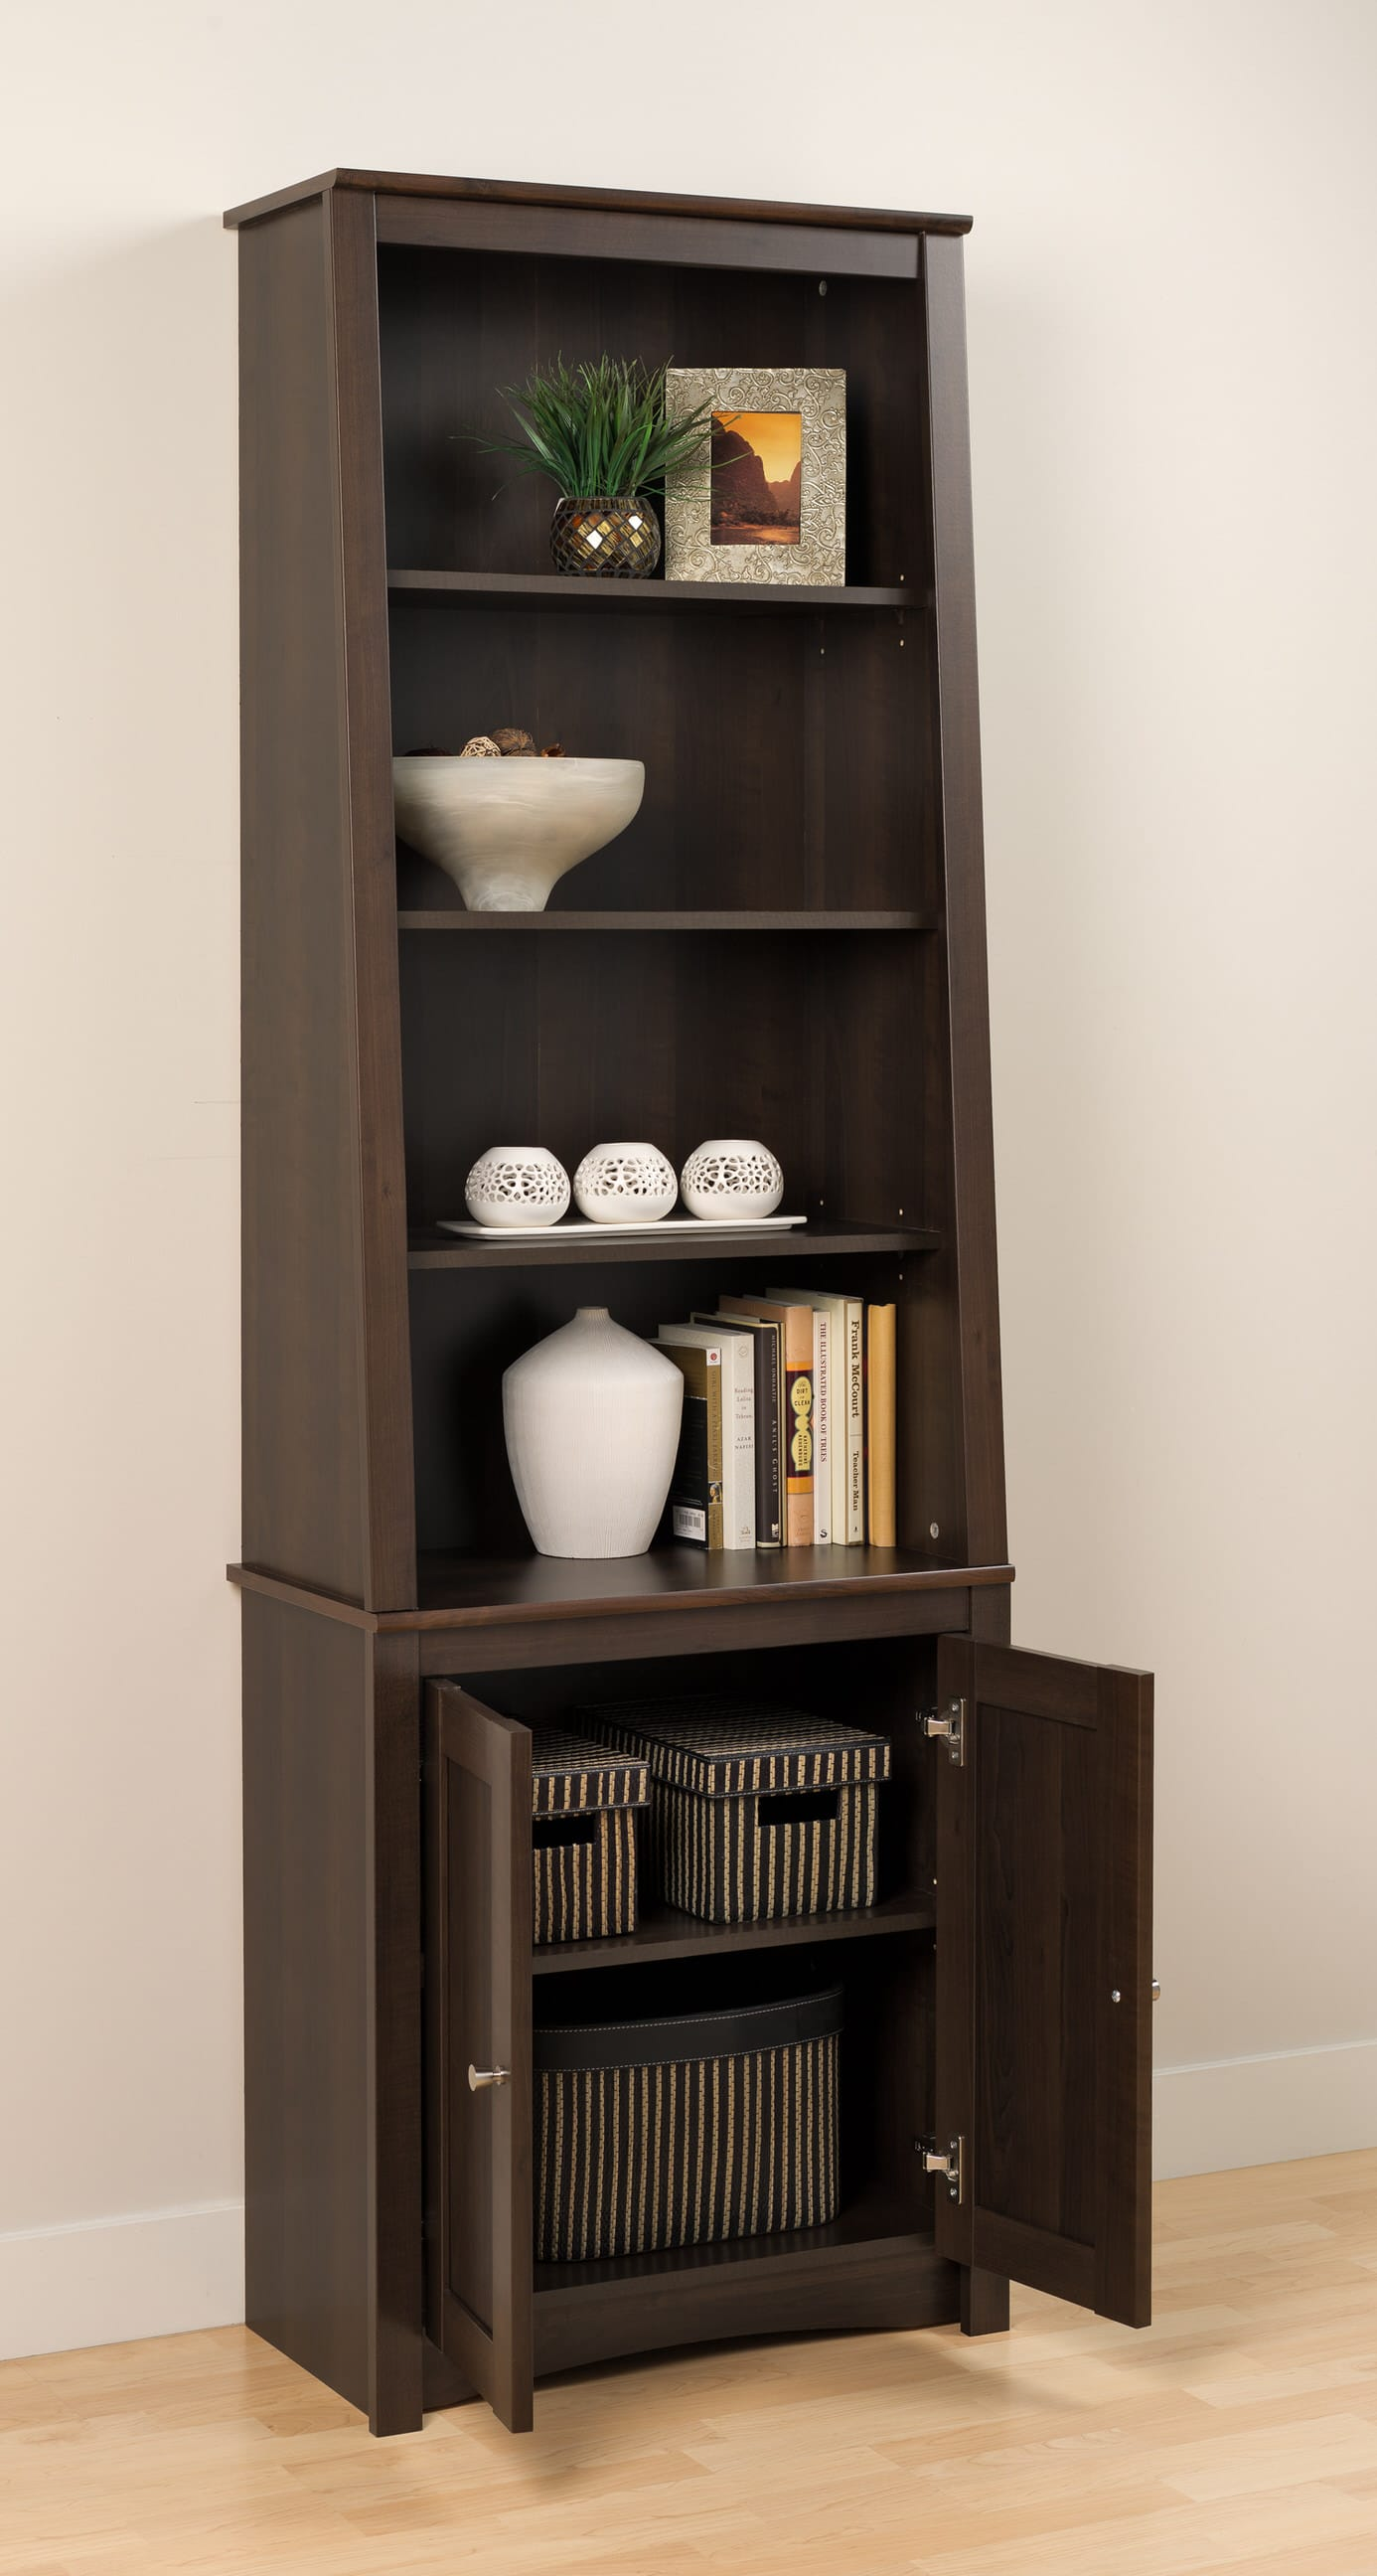 Tall Slant Back Bookcase W Doors By Prepac